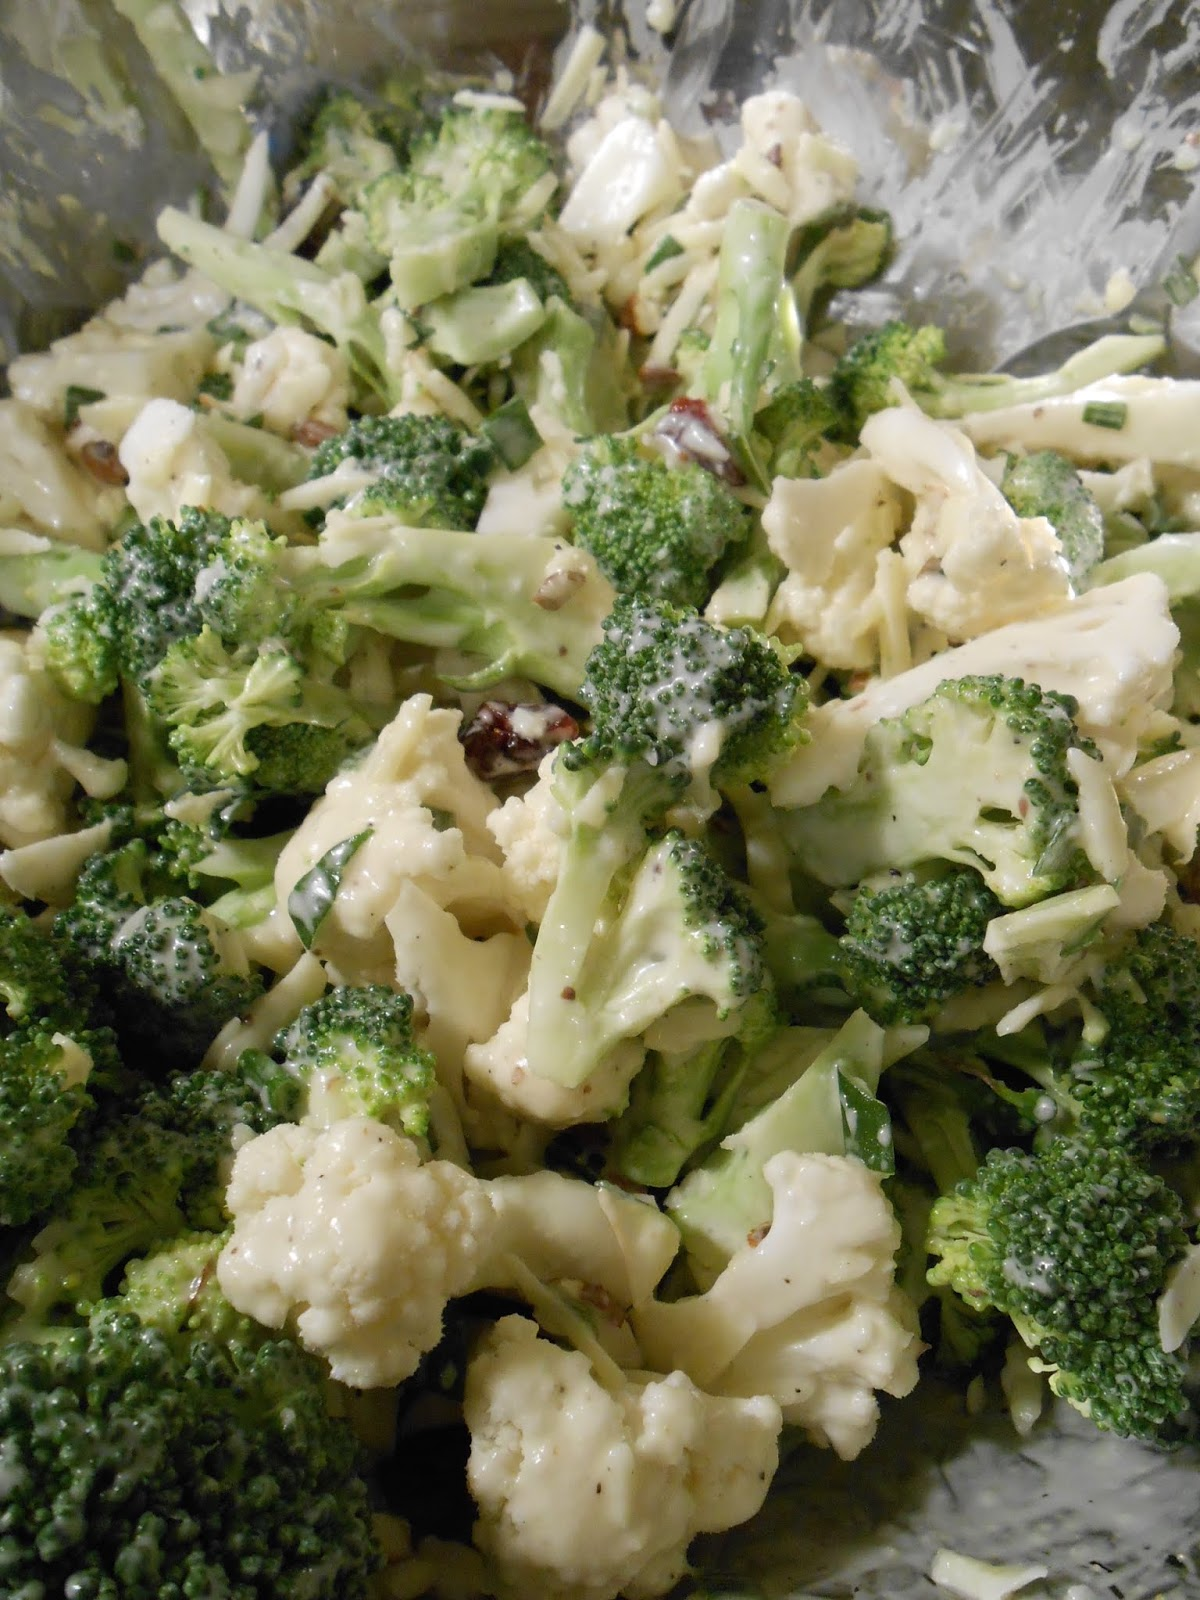 Eat cook and love: Salade crémeuse de brocoli et chou-fleur